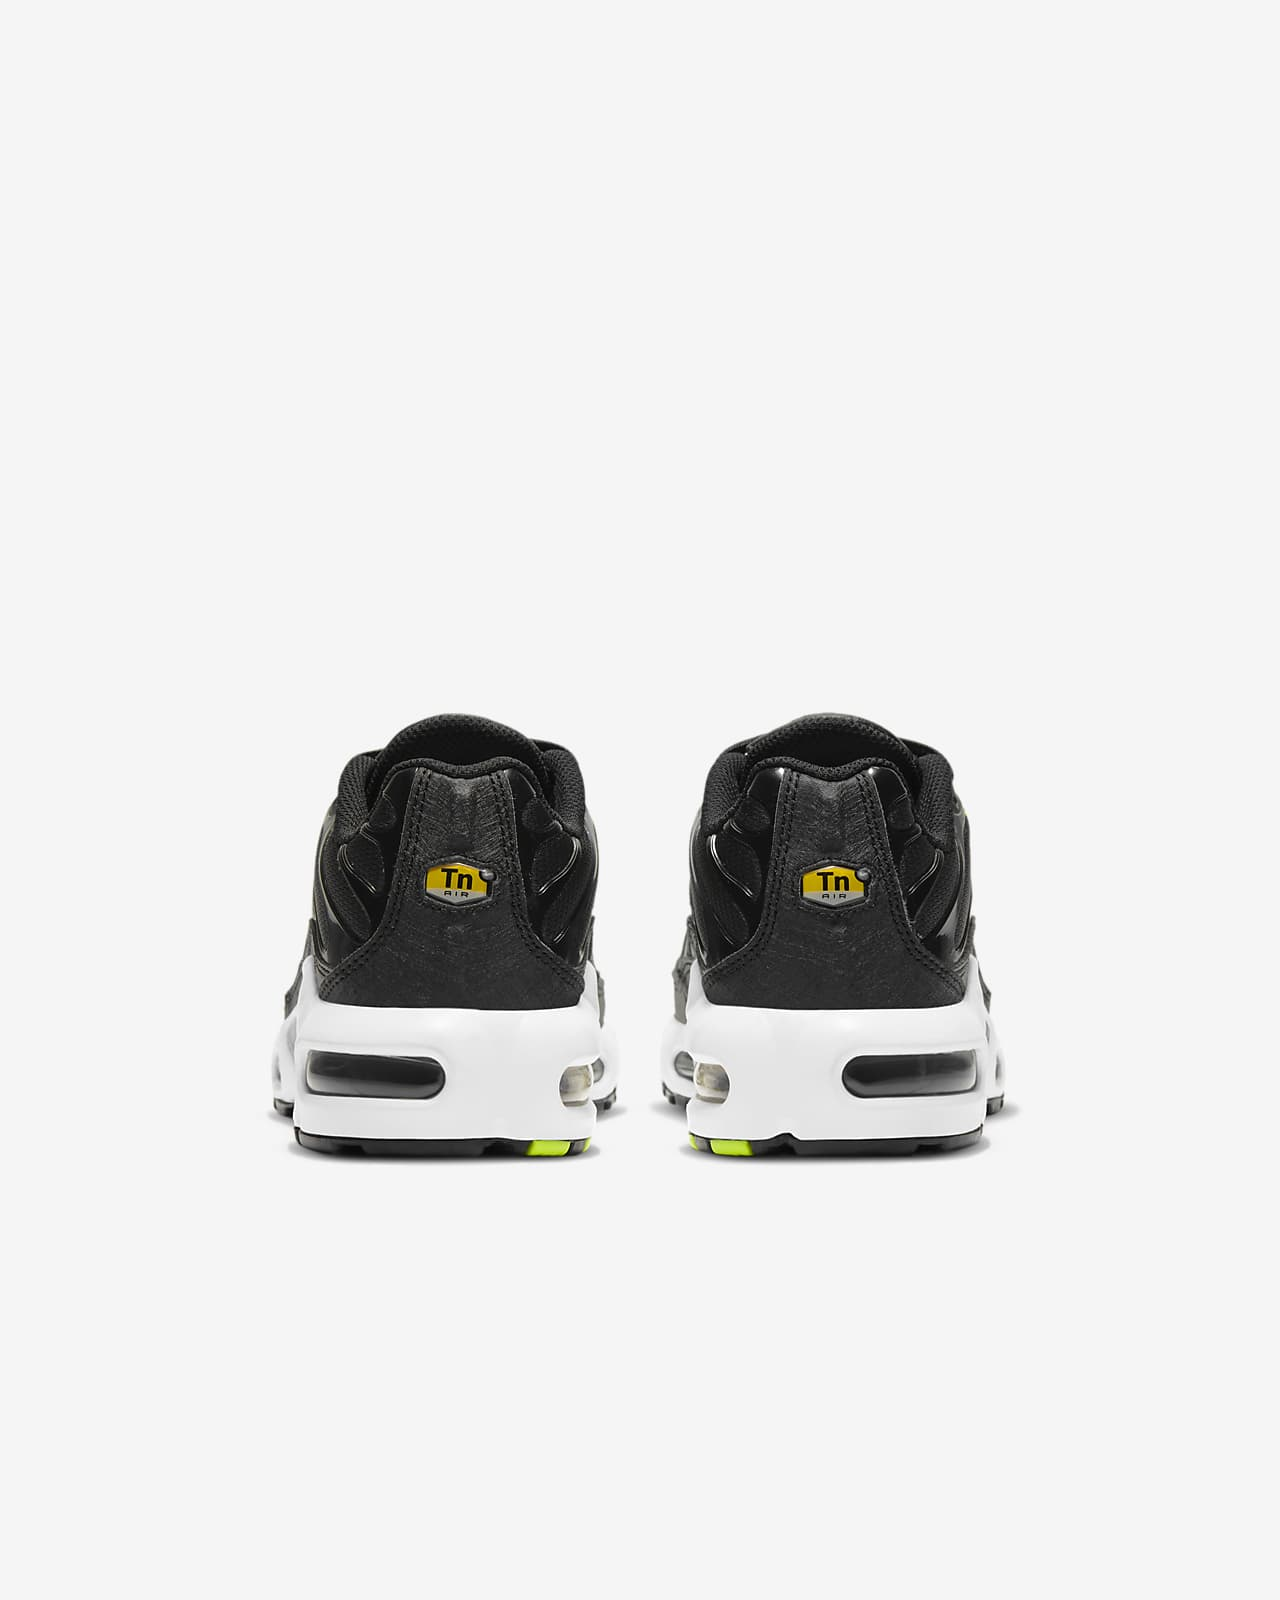 Nike Air Max Plus 1 Older Kids' Shoe. Nike LU